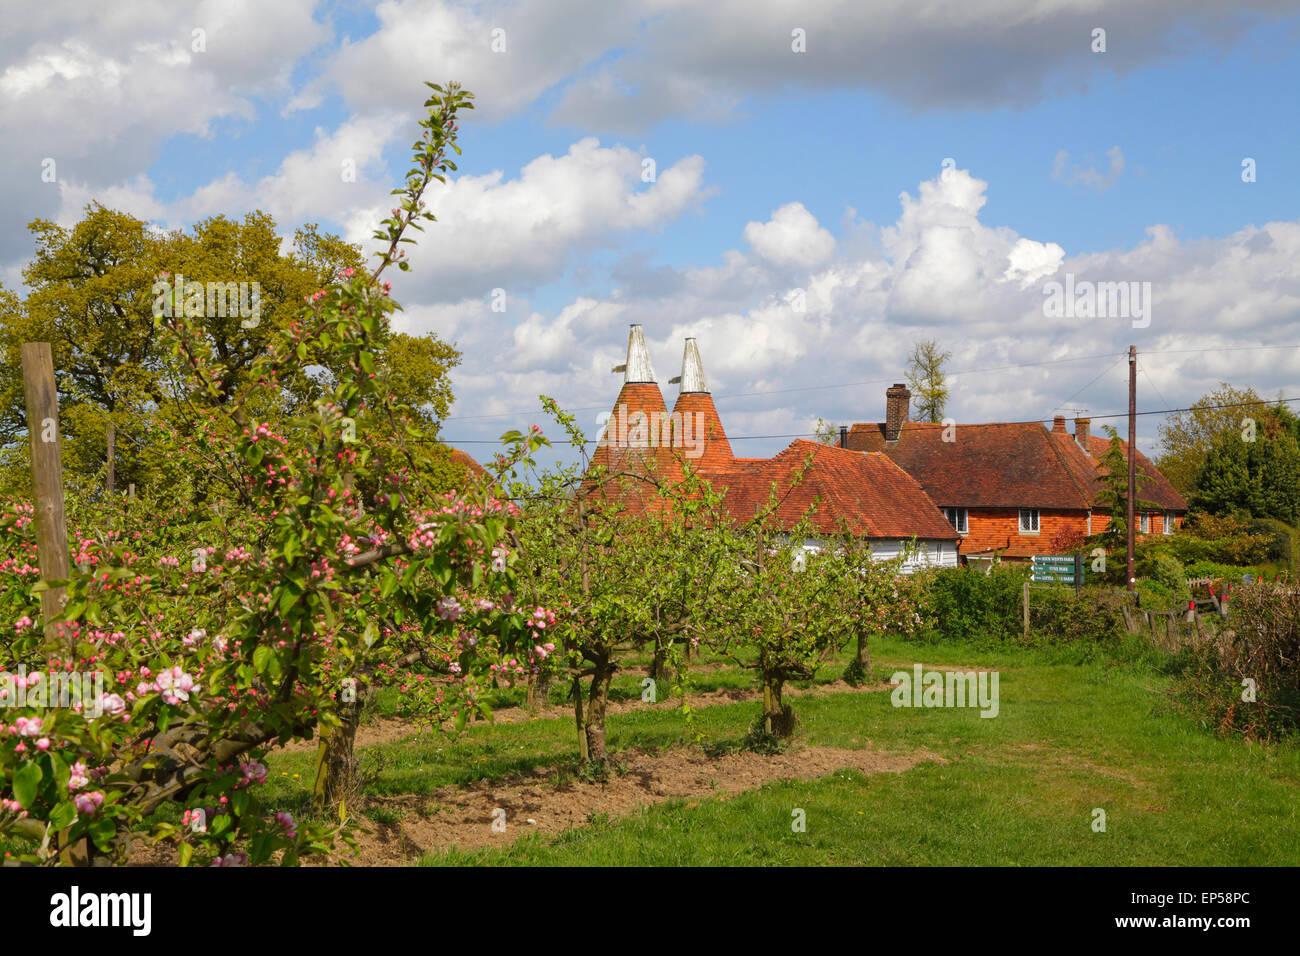 Oast Houses and Apple Blossom Kent, UK, England, Britain, GB - Stock Image